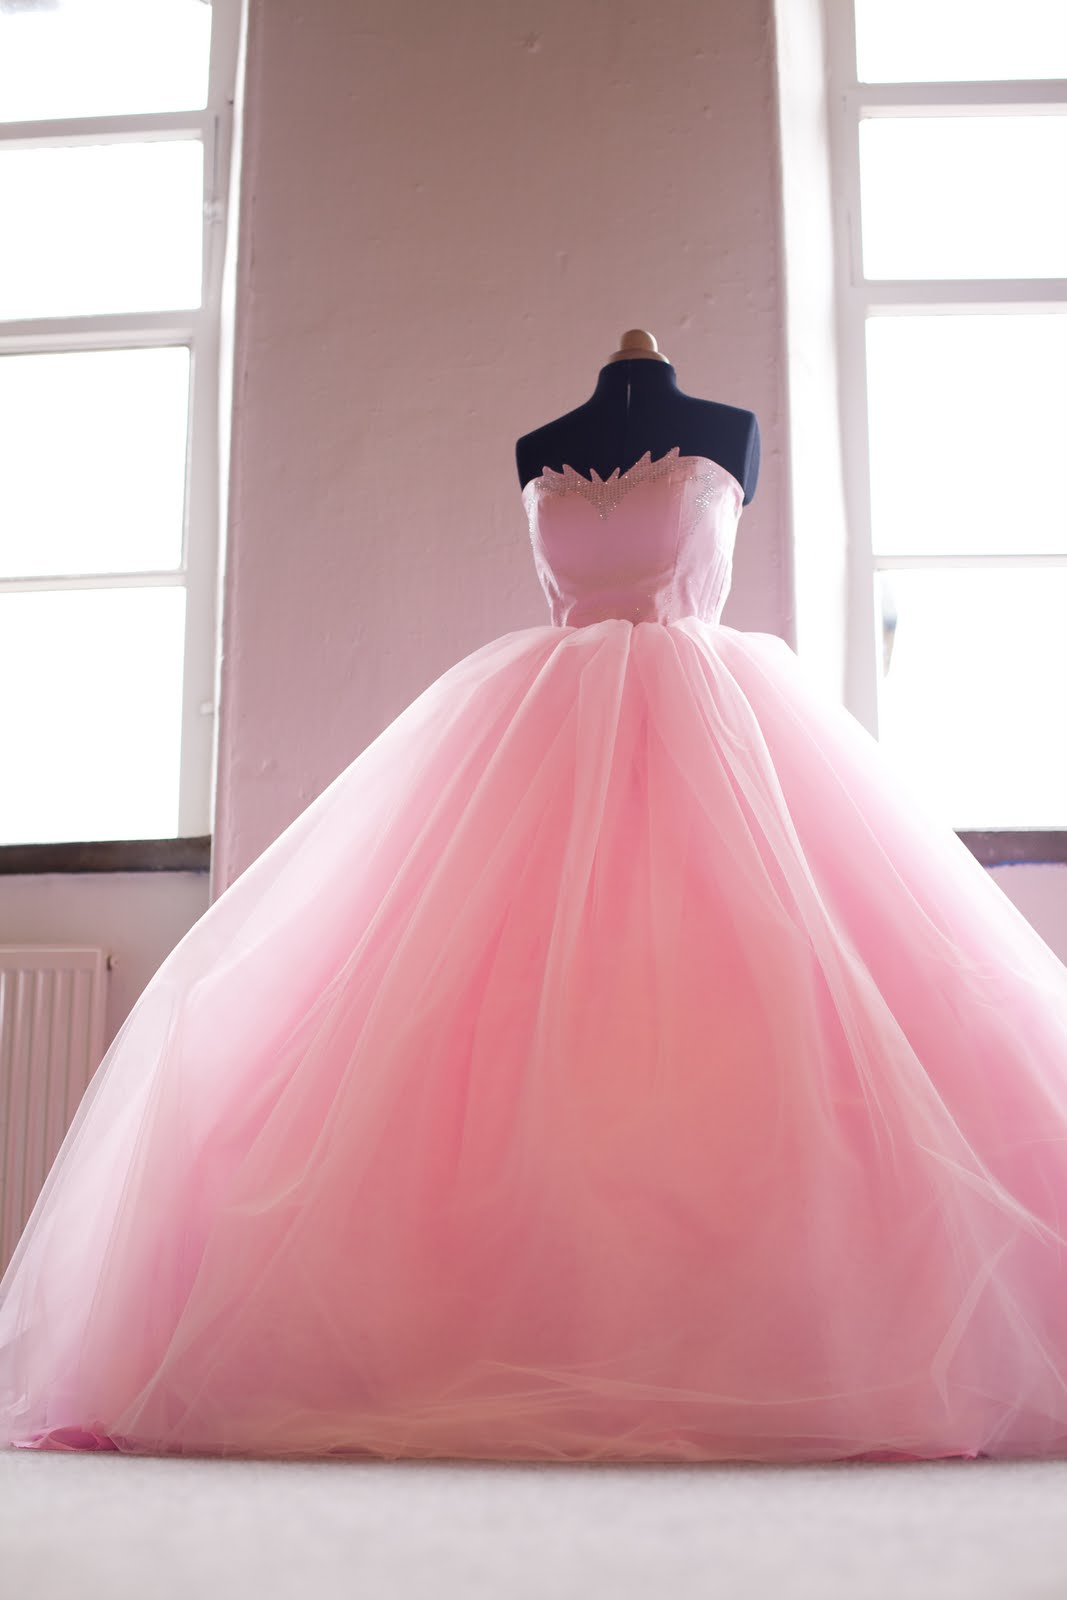 No. 9: My Very Big Fat Gypsy Style Prom Dress